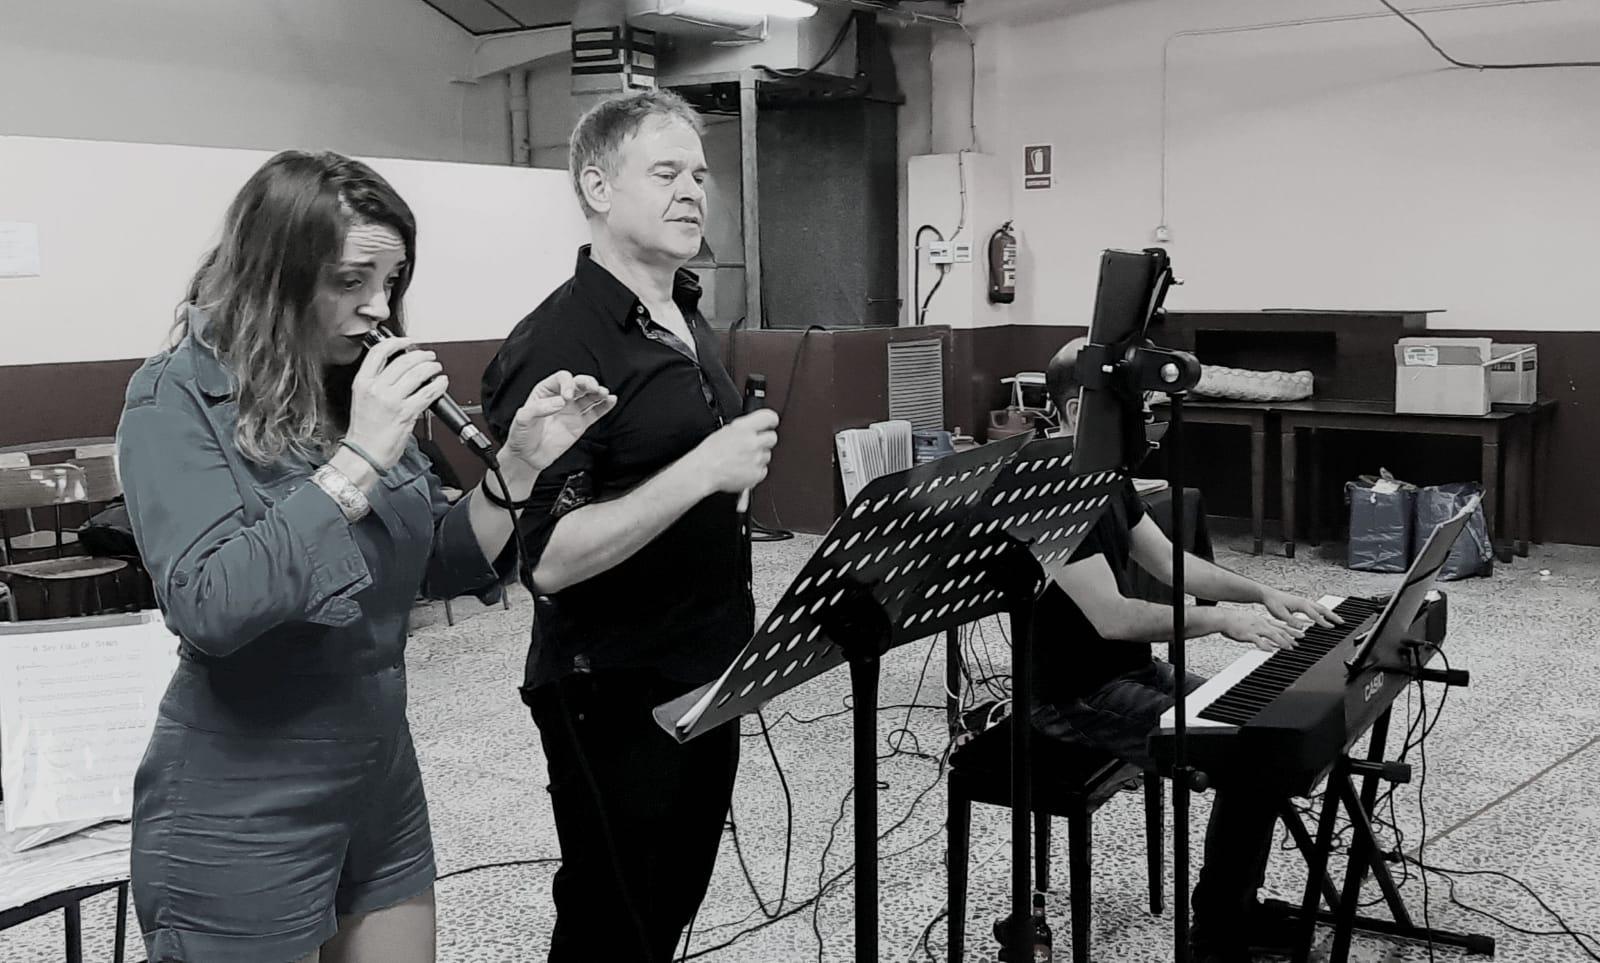 Charo Tris & Jordi Moncayo. Beat Symphony ensayo 01